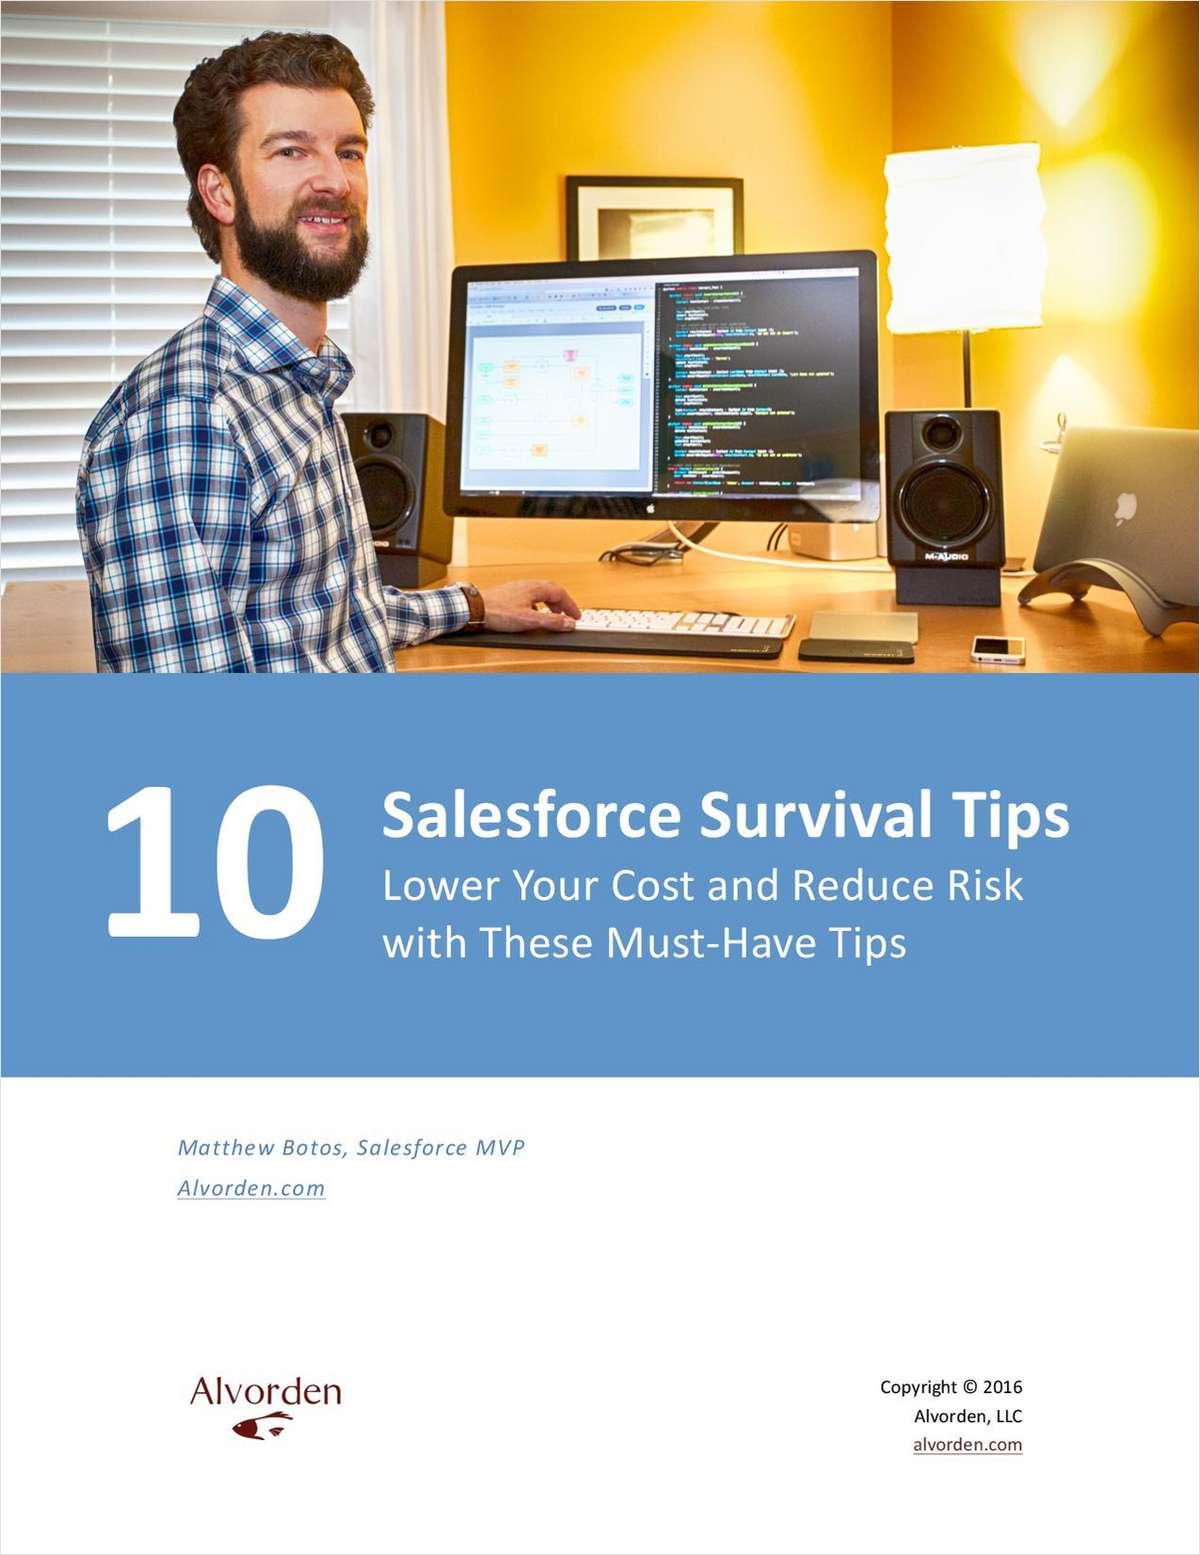 10 Salesforce Survival Tips